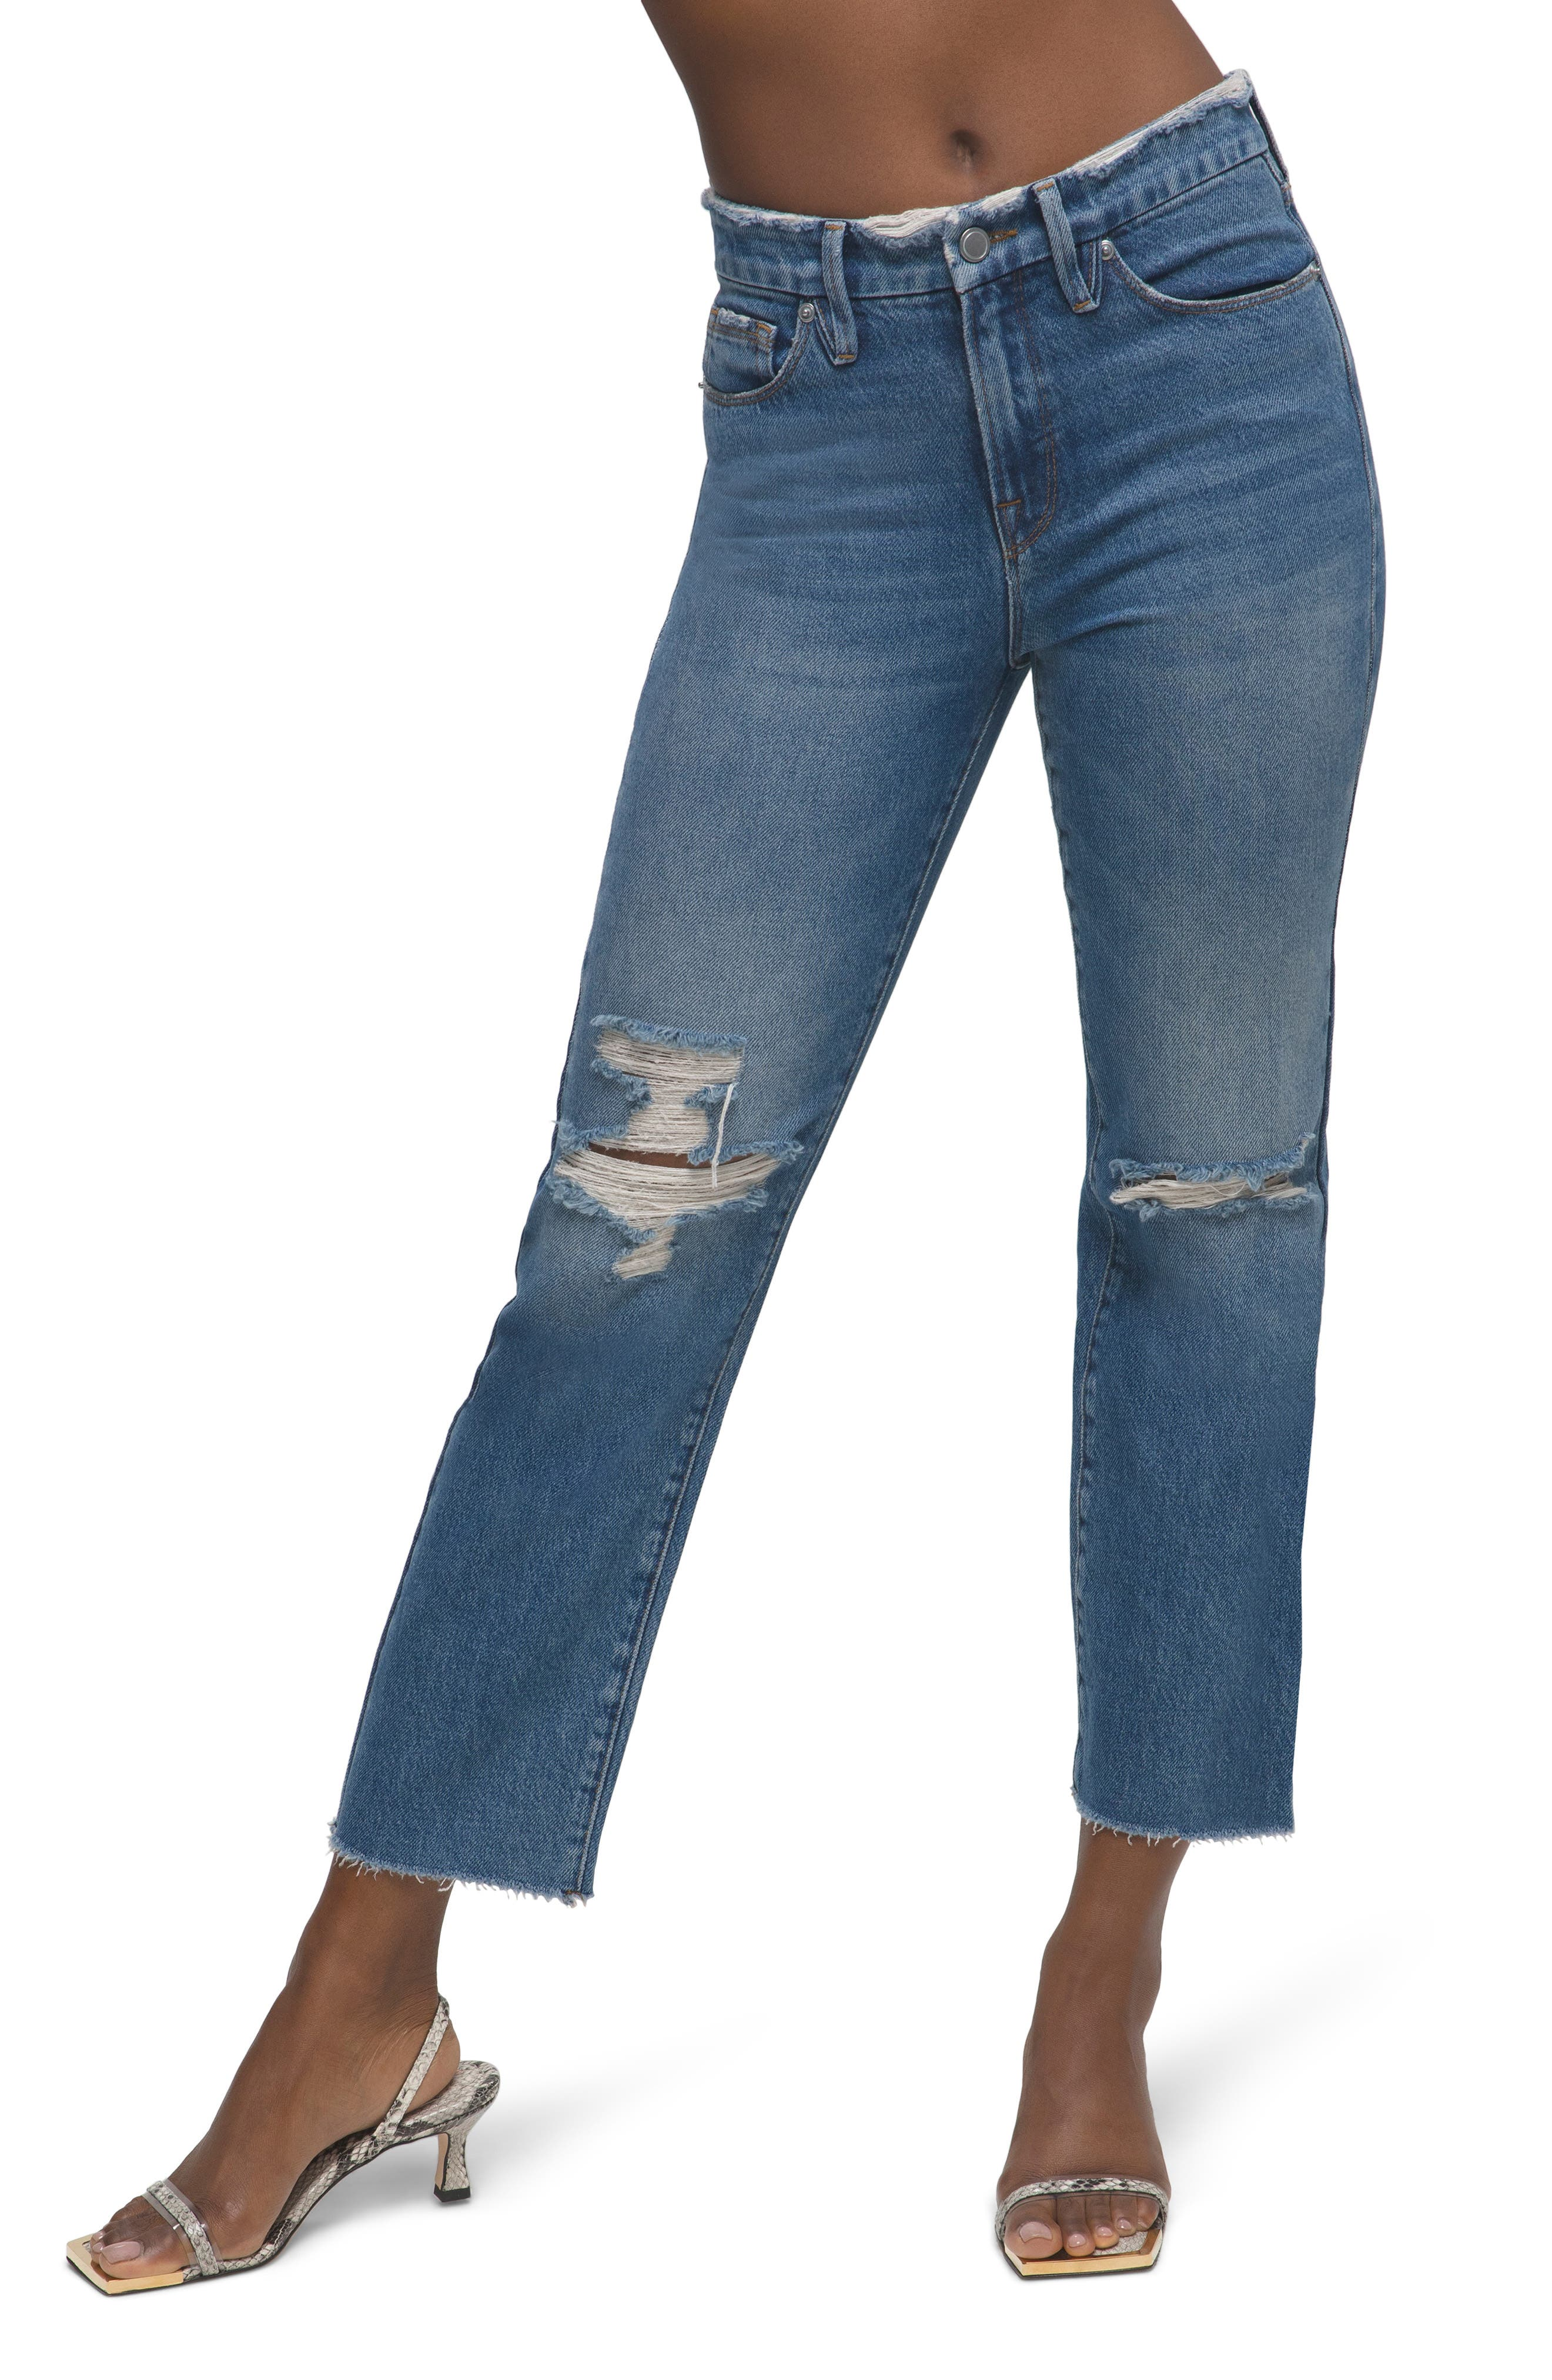 Distressed High Waist Frayed Jeans